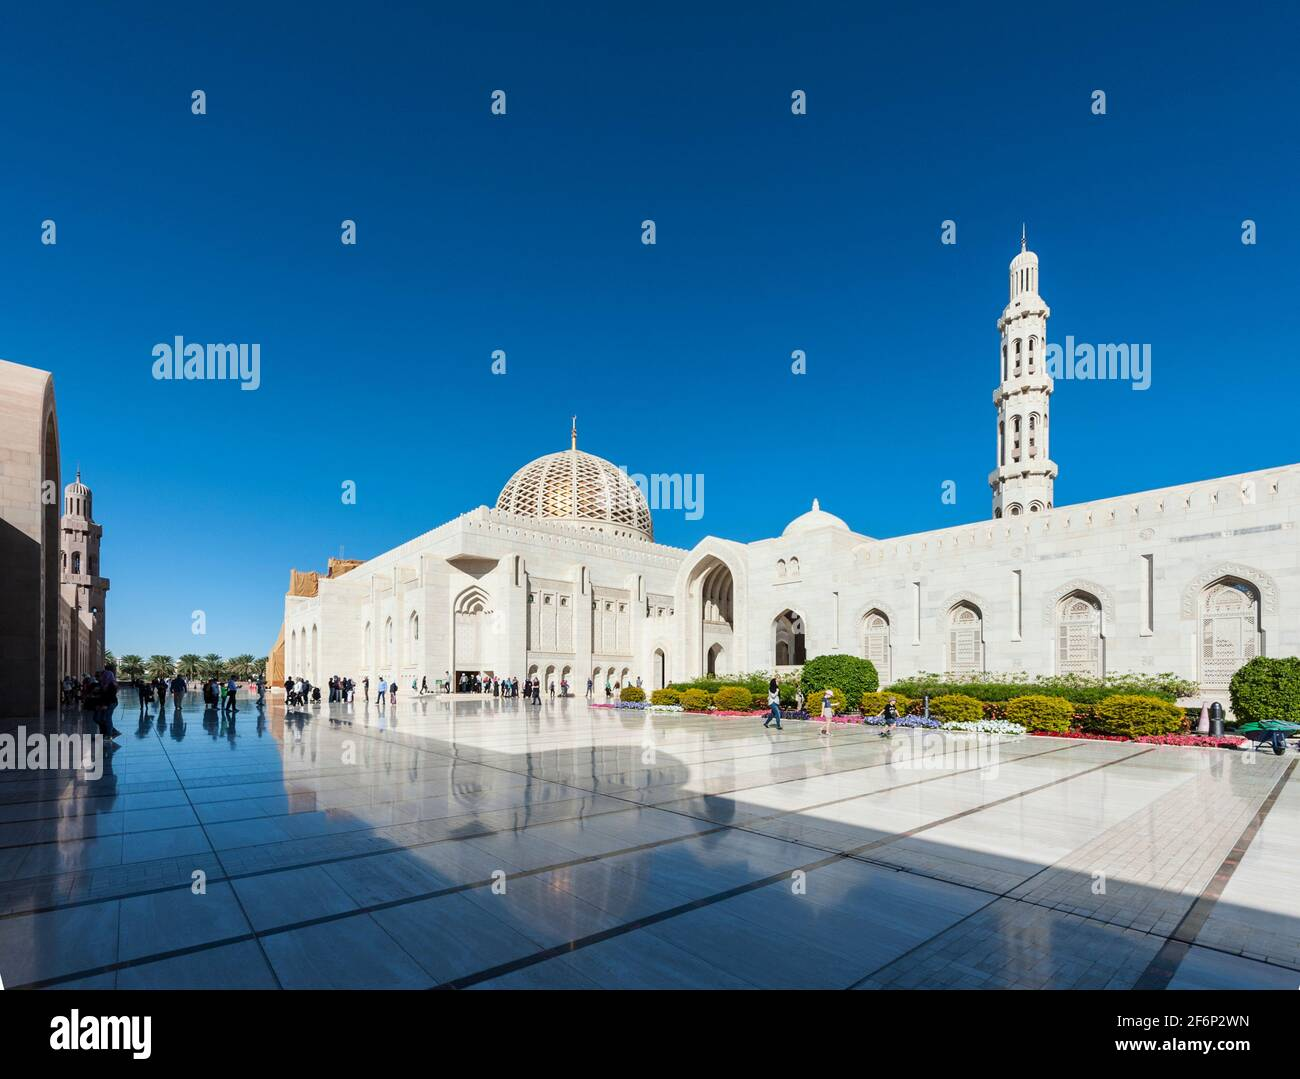 Gran Mezquita Sultan Qaboos, Muscat, Omán Foto de stock